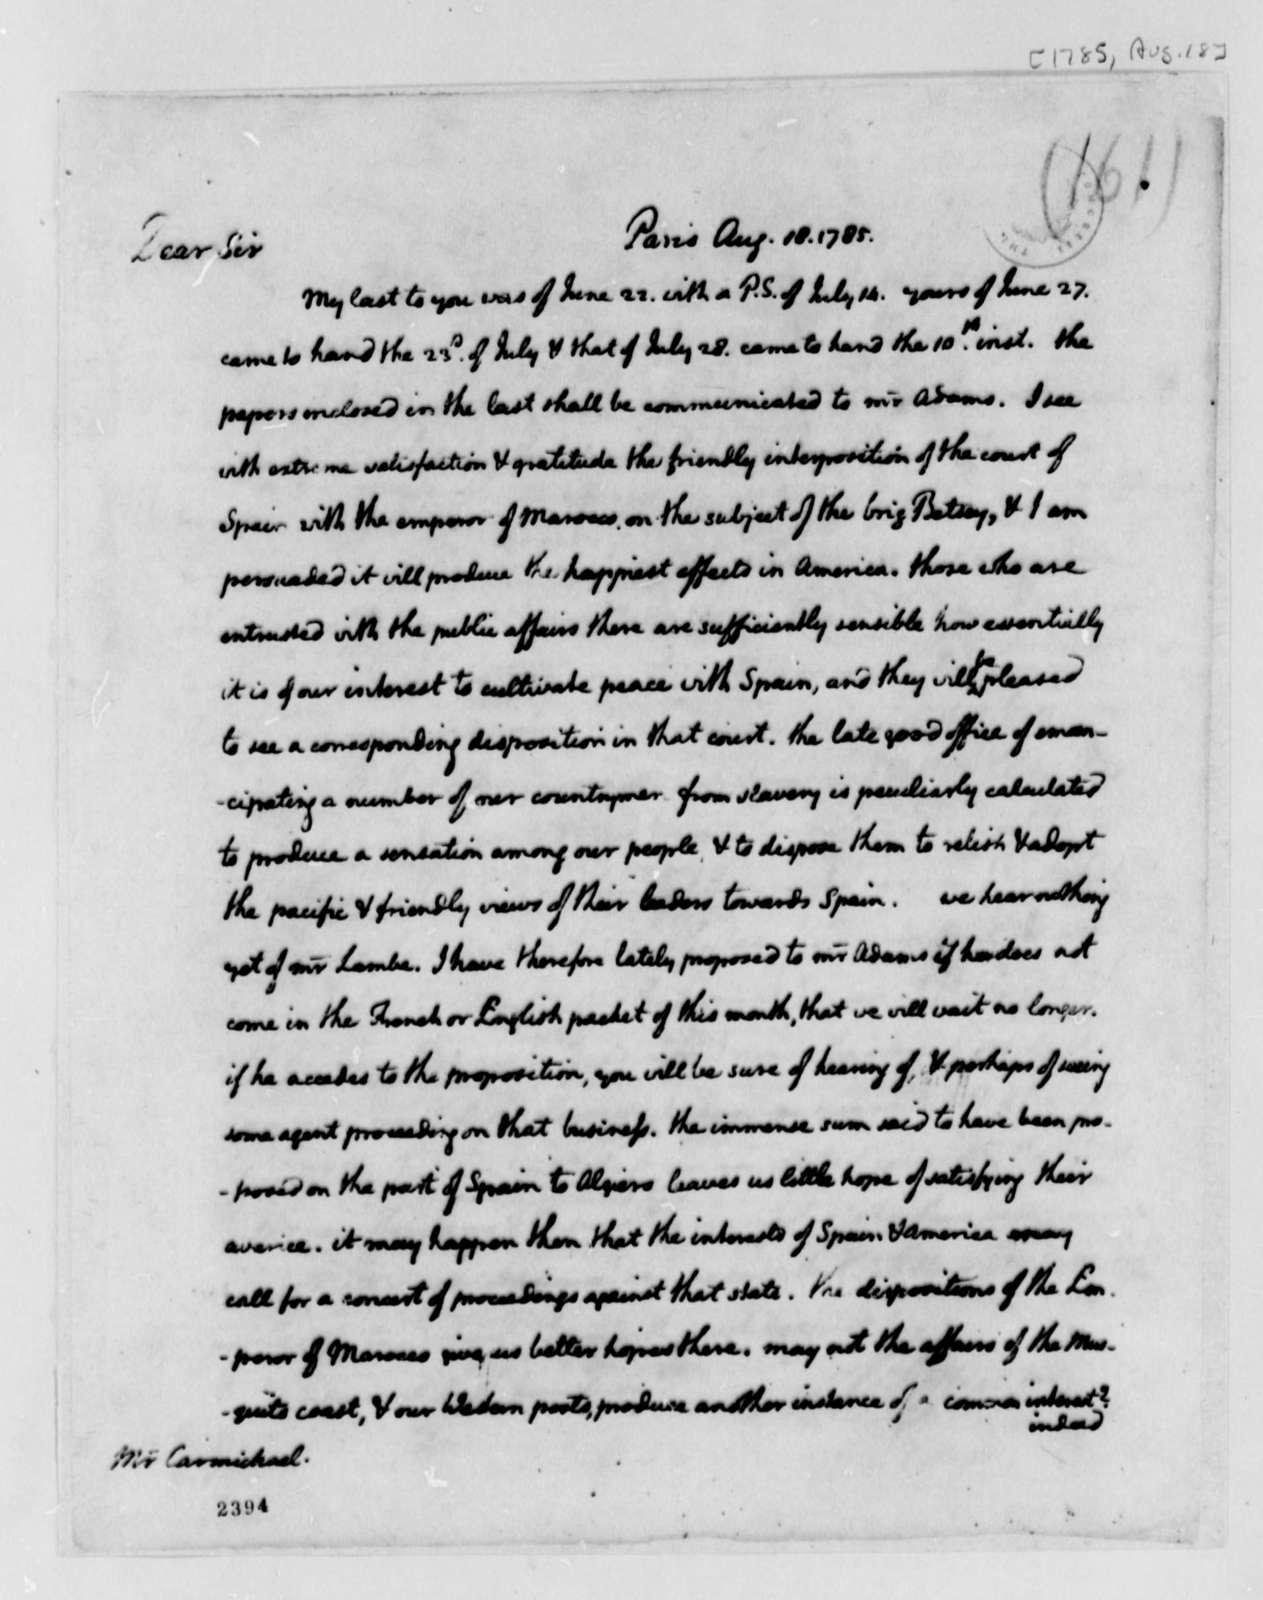 Thomas Jefferson to William Carmichael, August 18, 1785